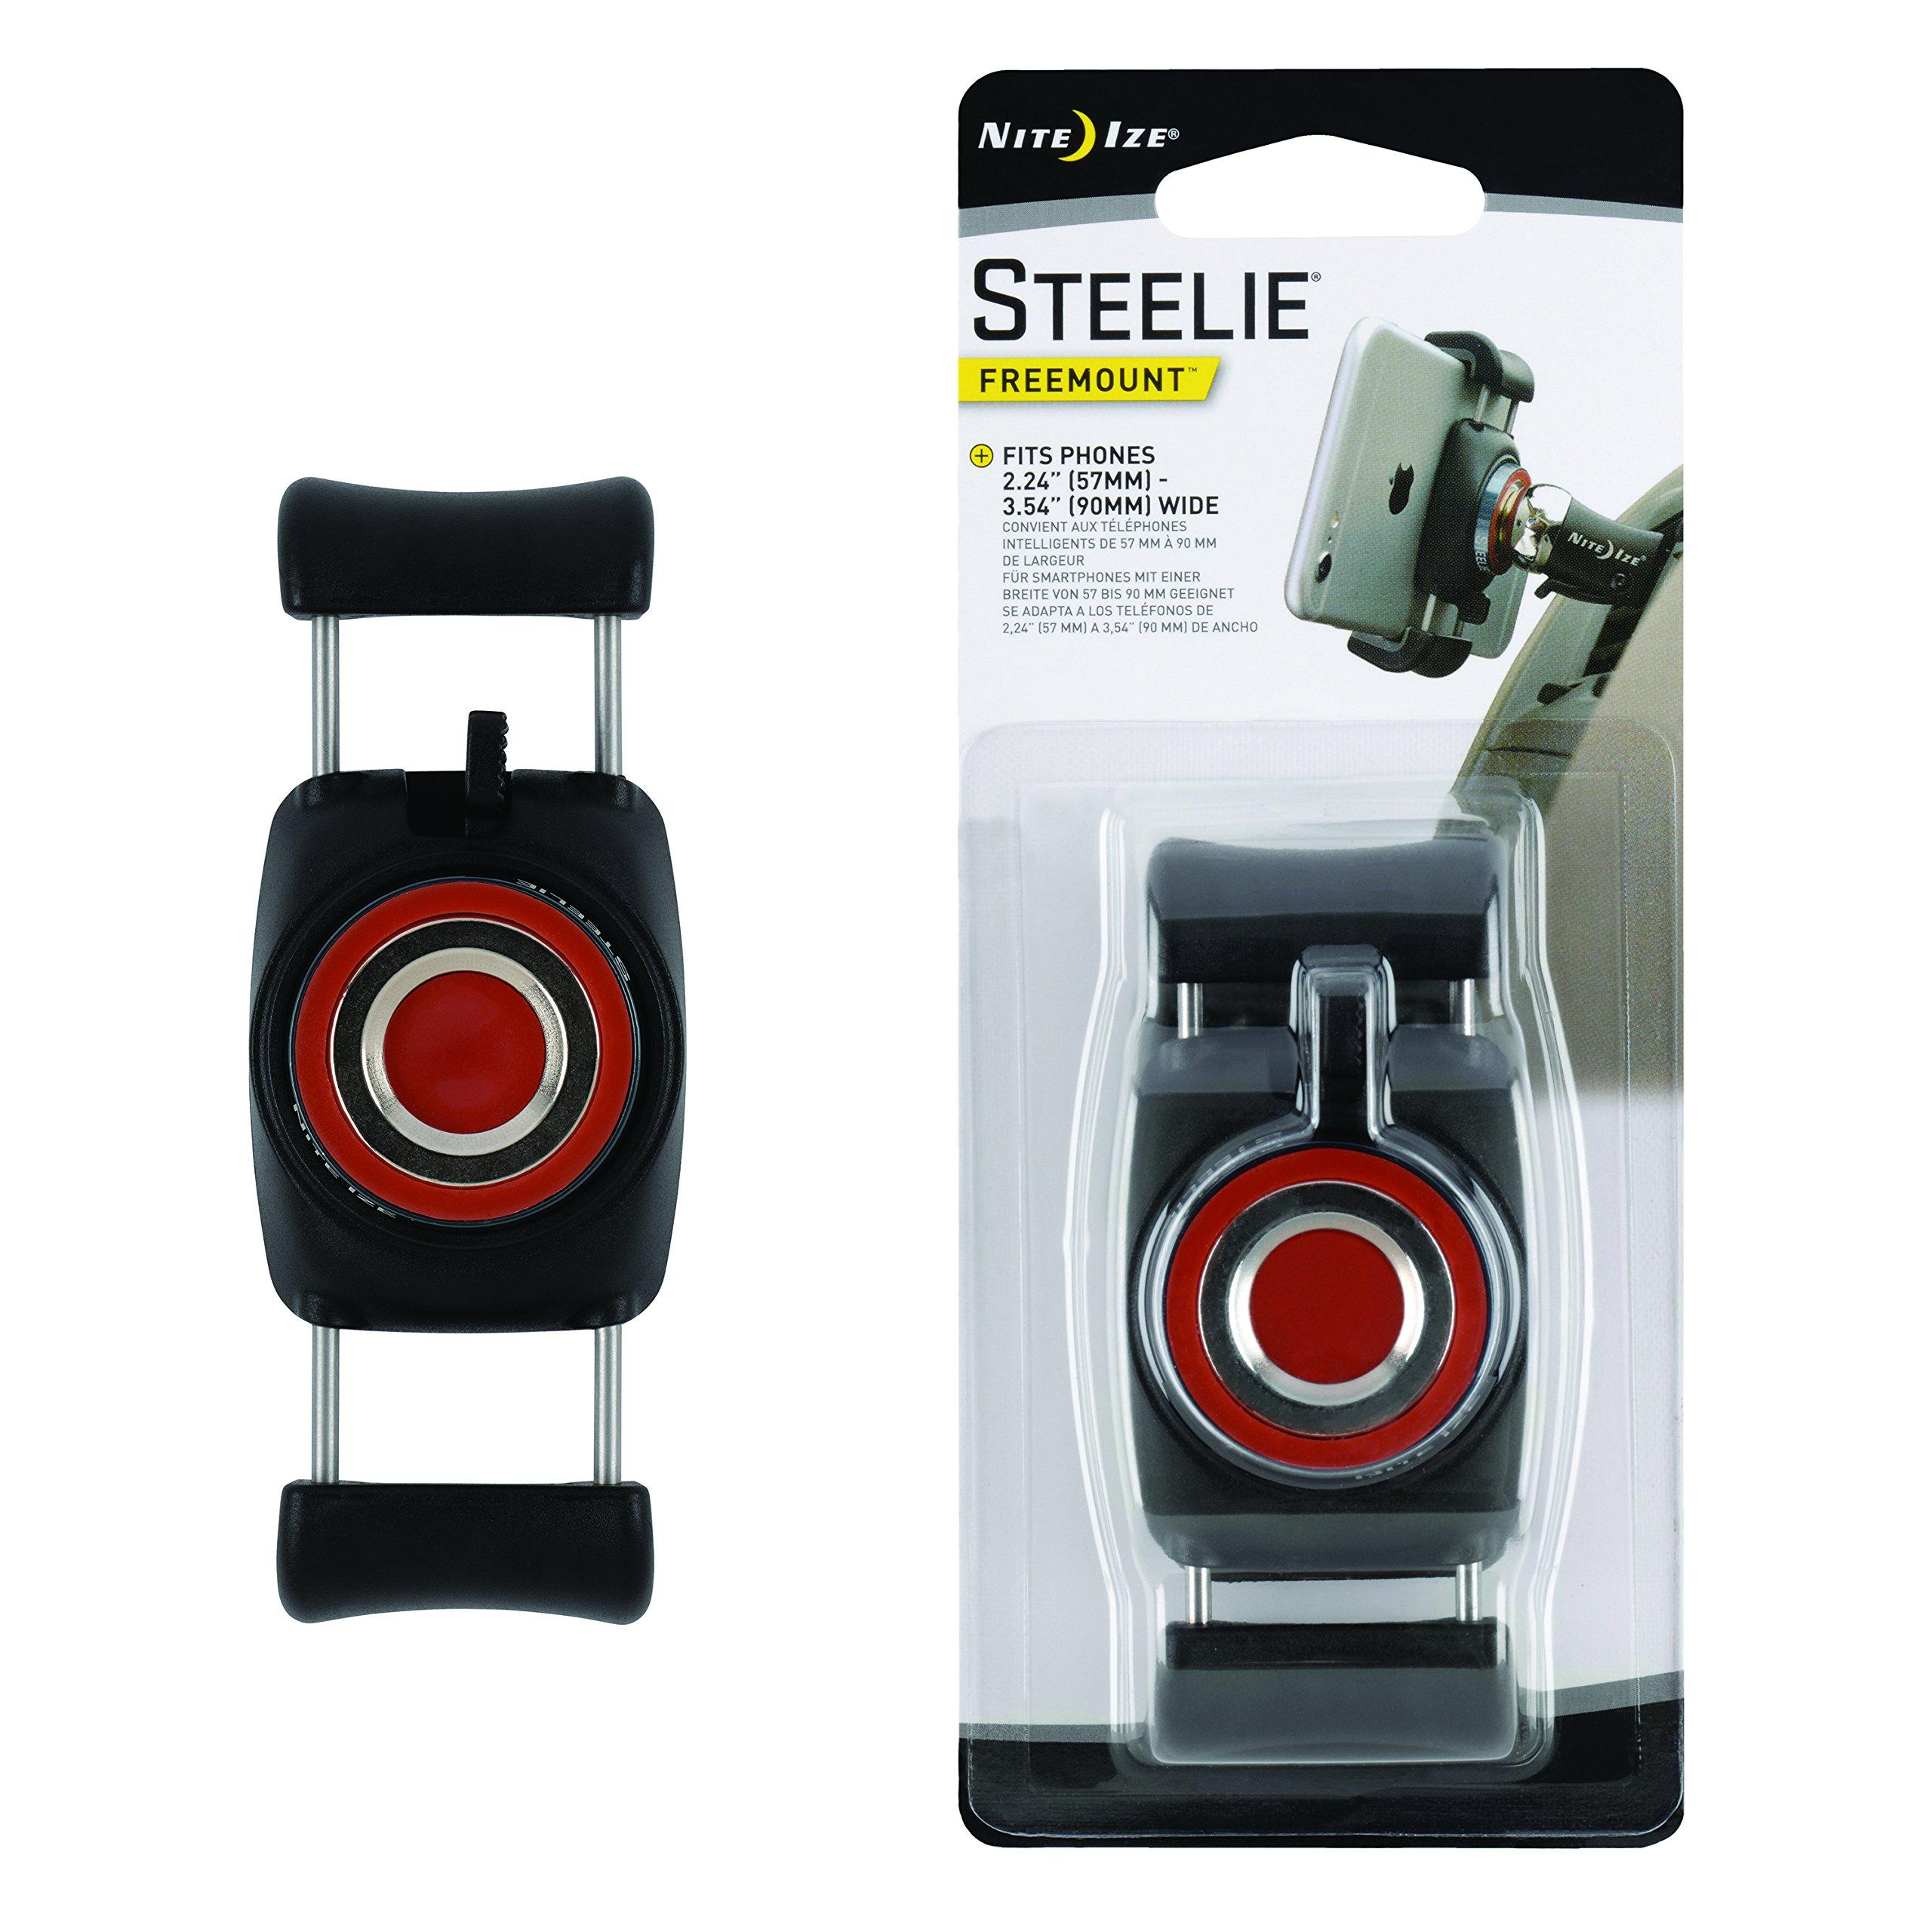 Nite Ize STF-01-R7 Original Steelie FreeMount Bracket - Additional FreeMount for Steelie Magnetic Phone Mounting Systems